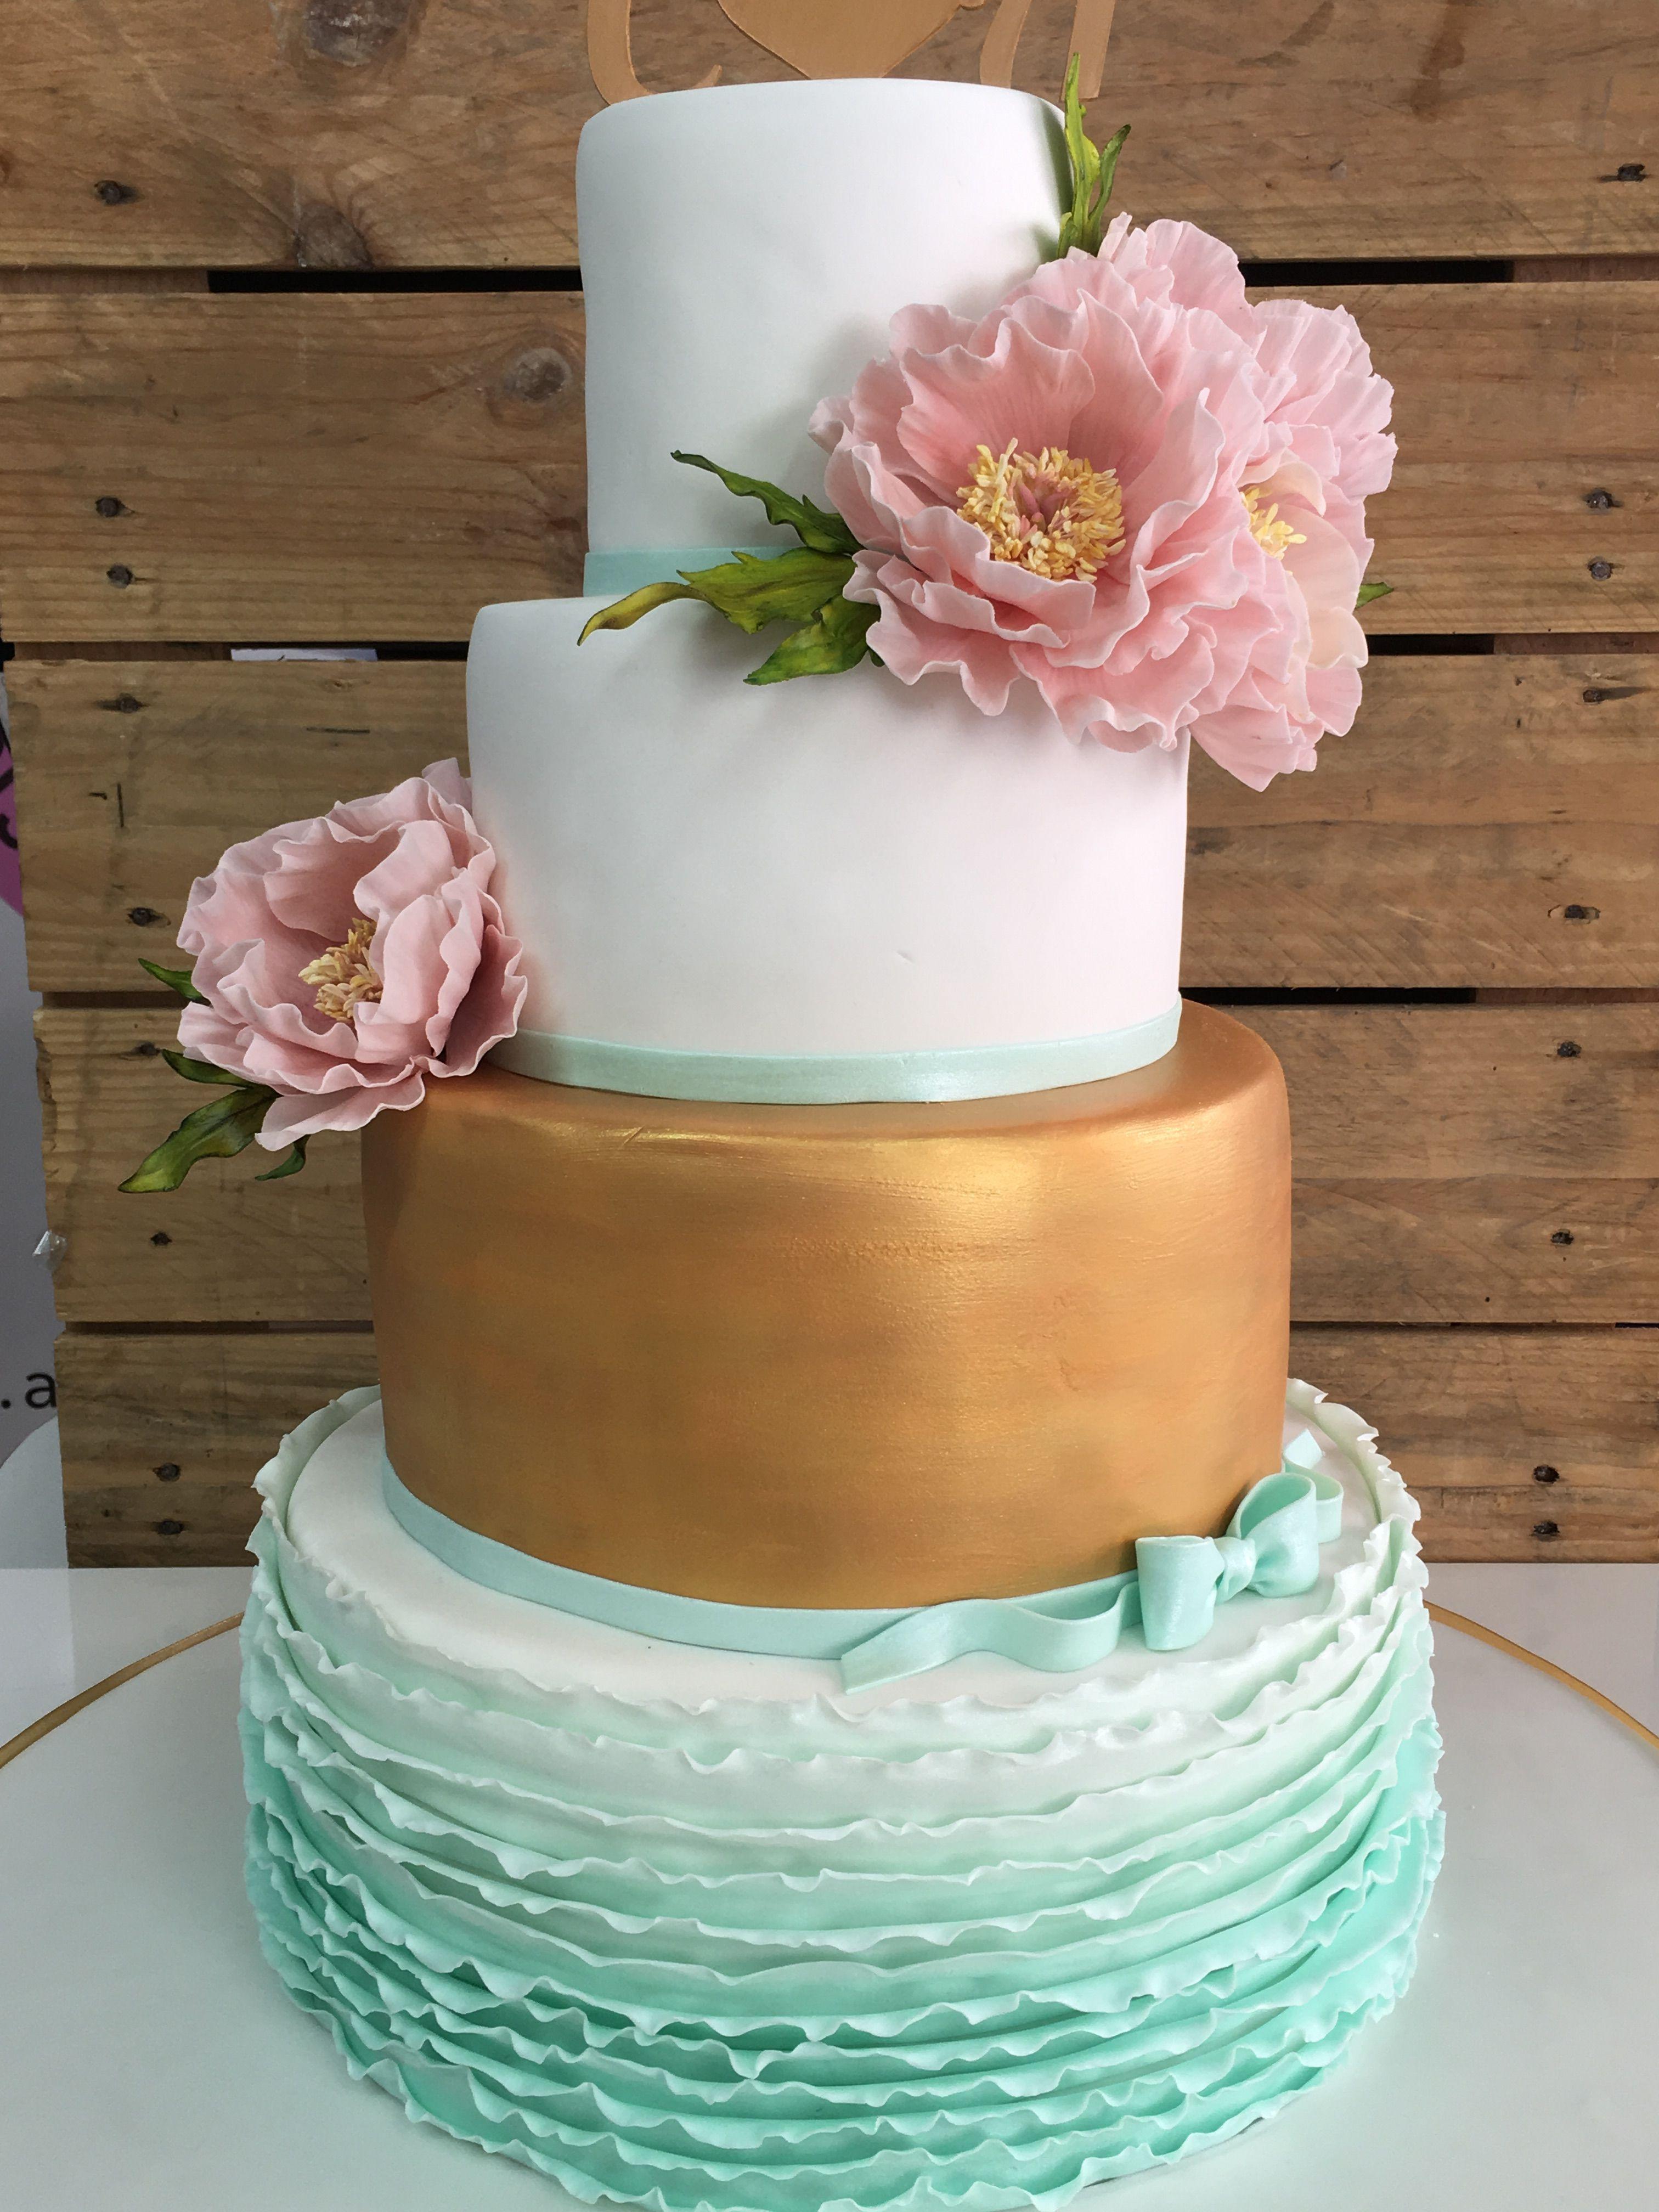 Winter wedding cake, Romantic wedding cake, Burgundy